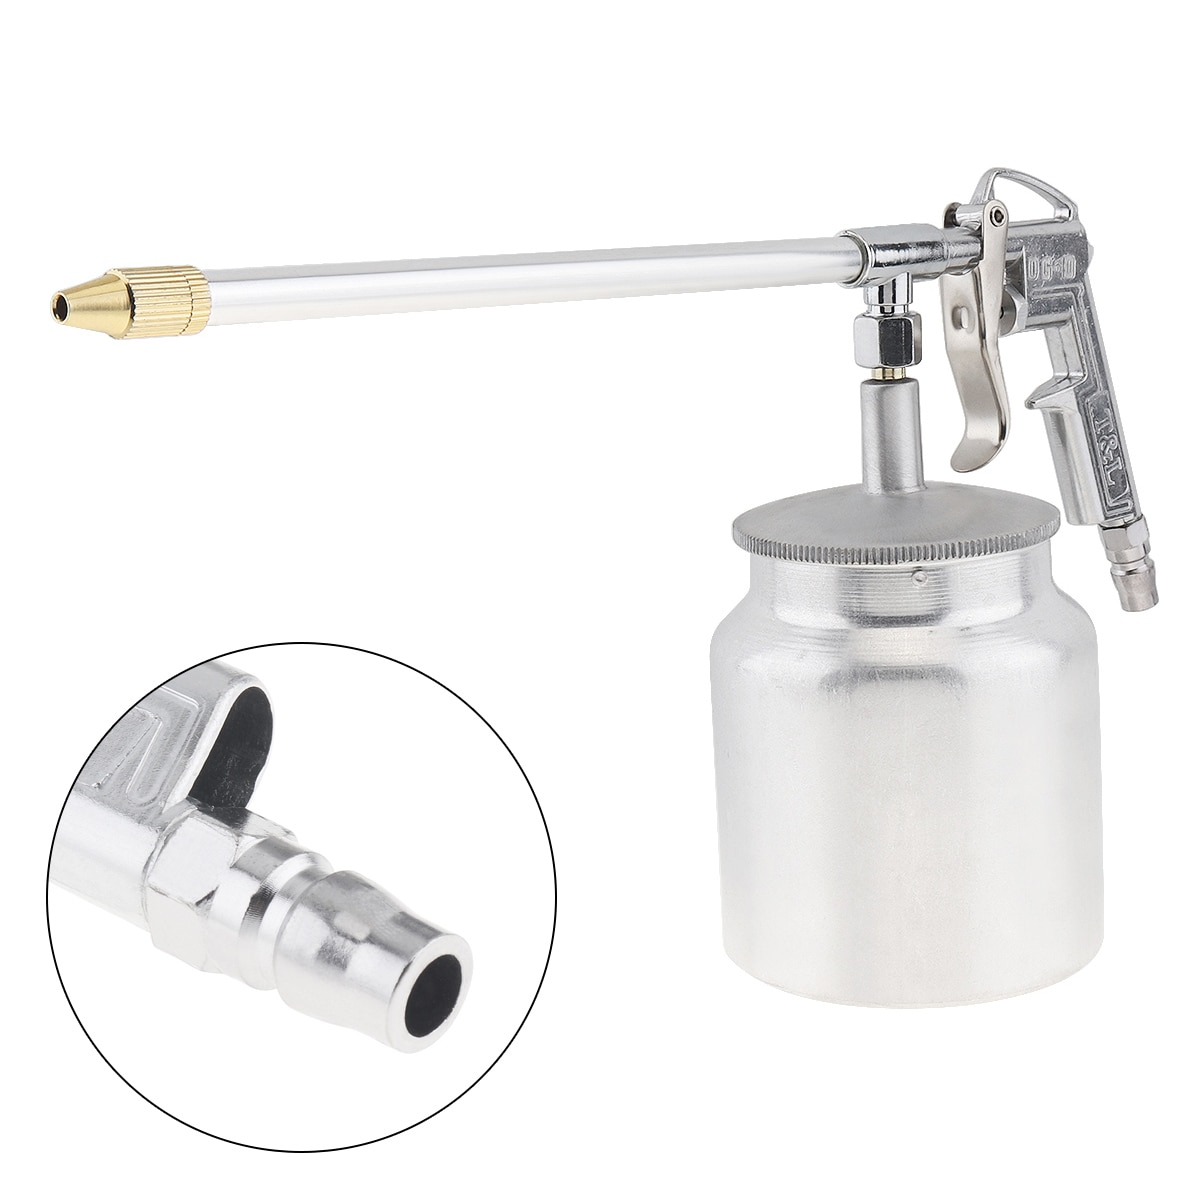 Silver Pot Type Pneumatic Spray Gun Paint Sprayer with 6mm Nozzle Caliber and Aluminum Pot for Furniture / Factory Facilities